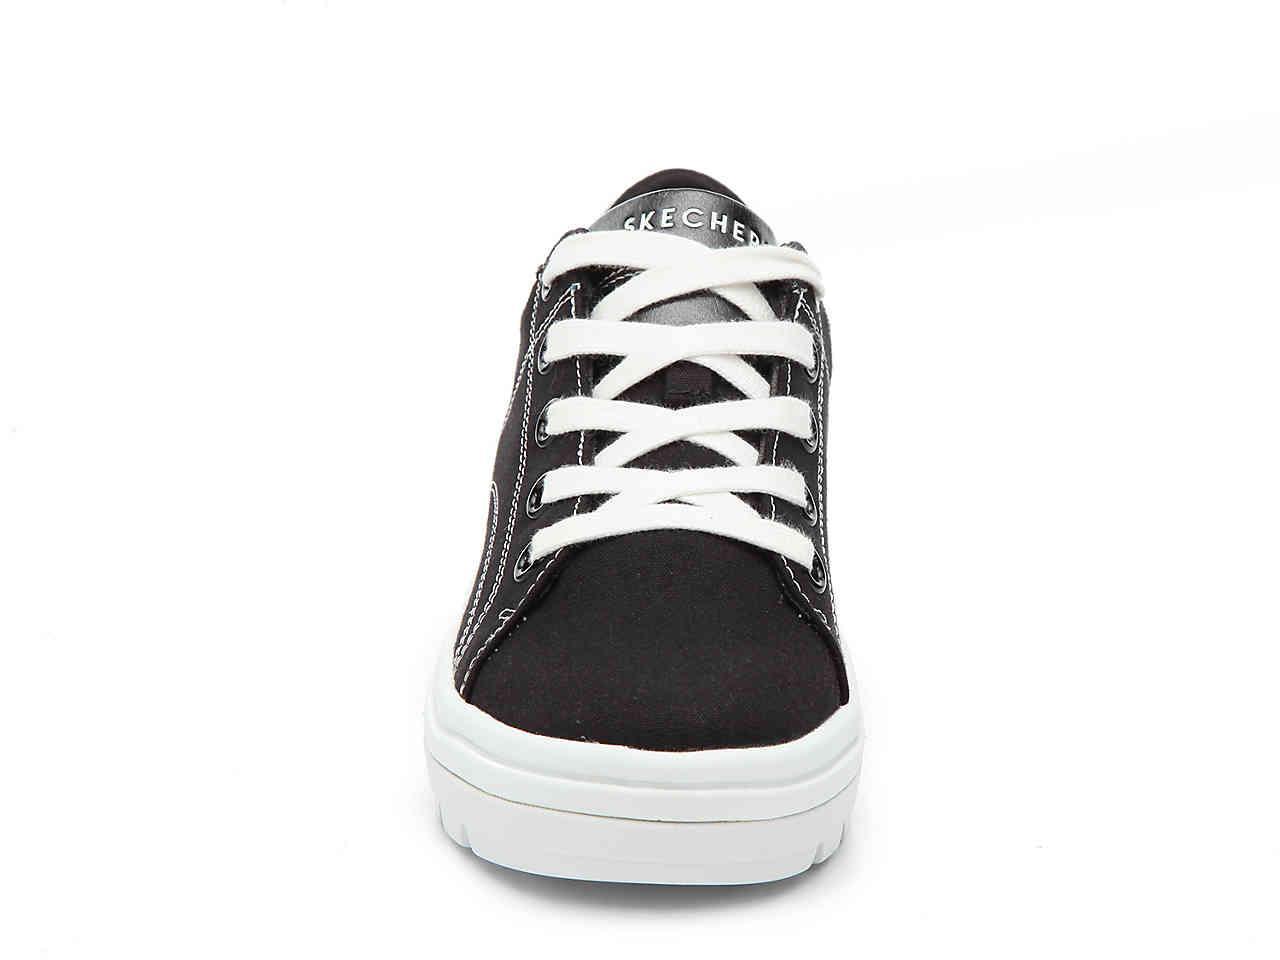 aef918c5c3f Skechers - Black Street Cleat Back Again Platform Sneaker - Lyst. View  fullscreen